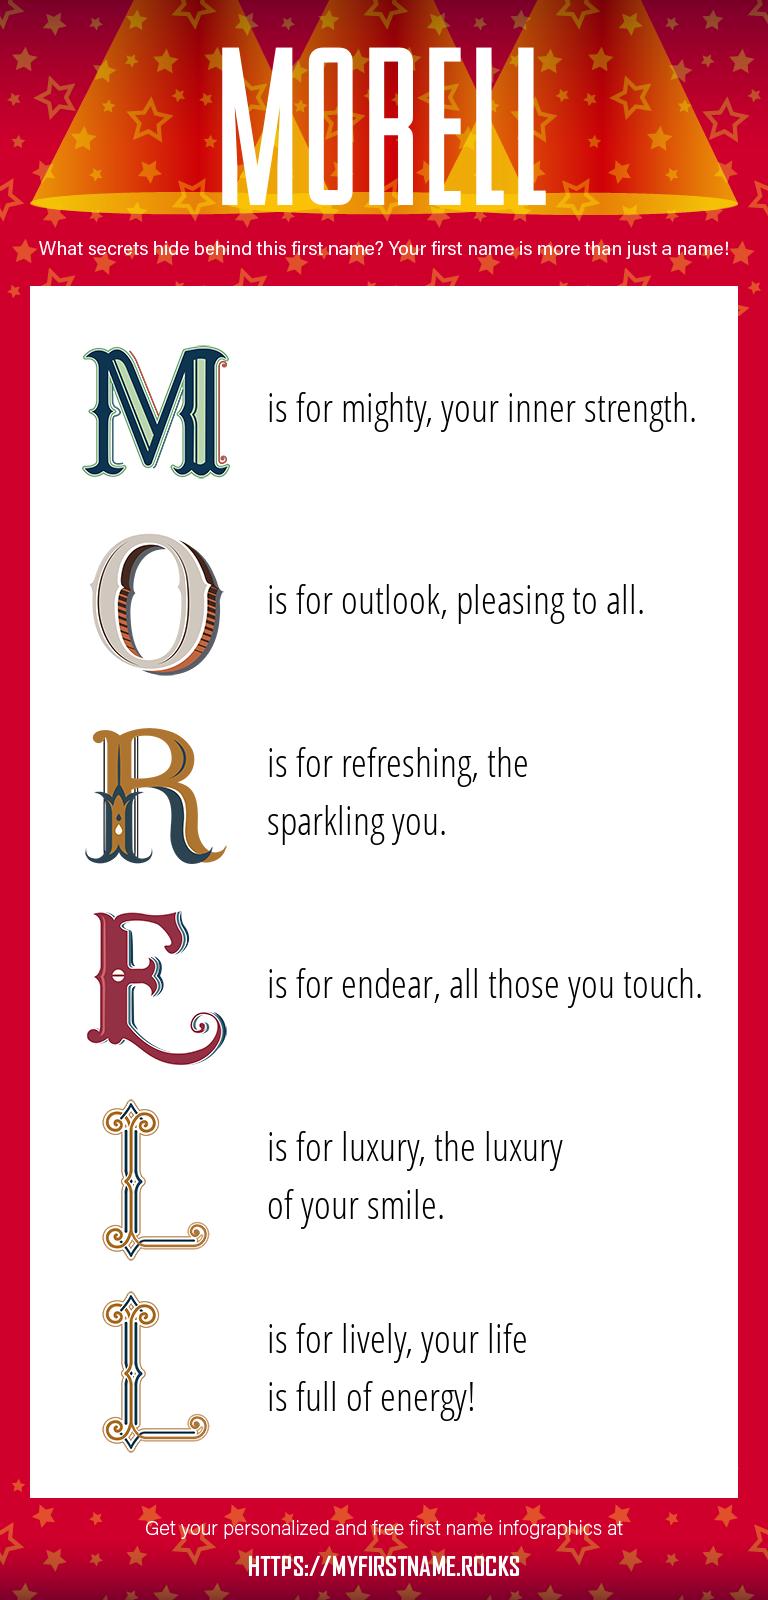 Morell Infographics